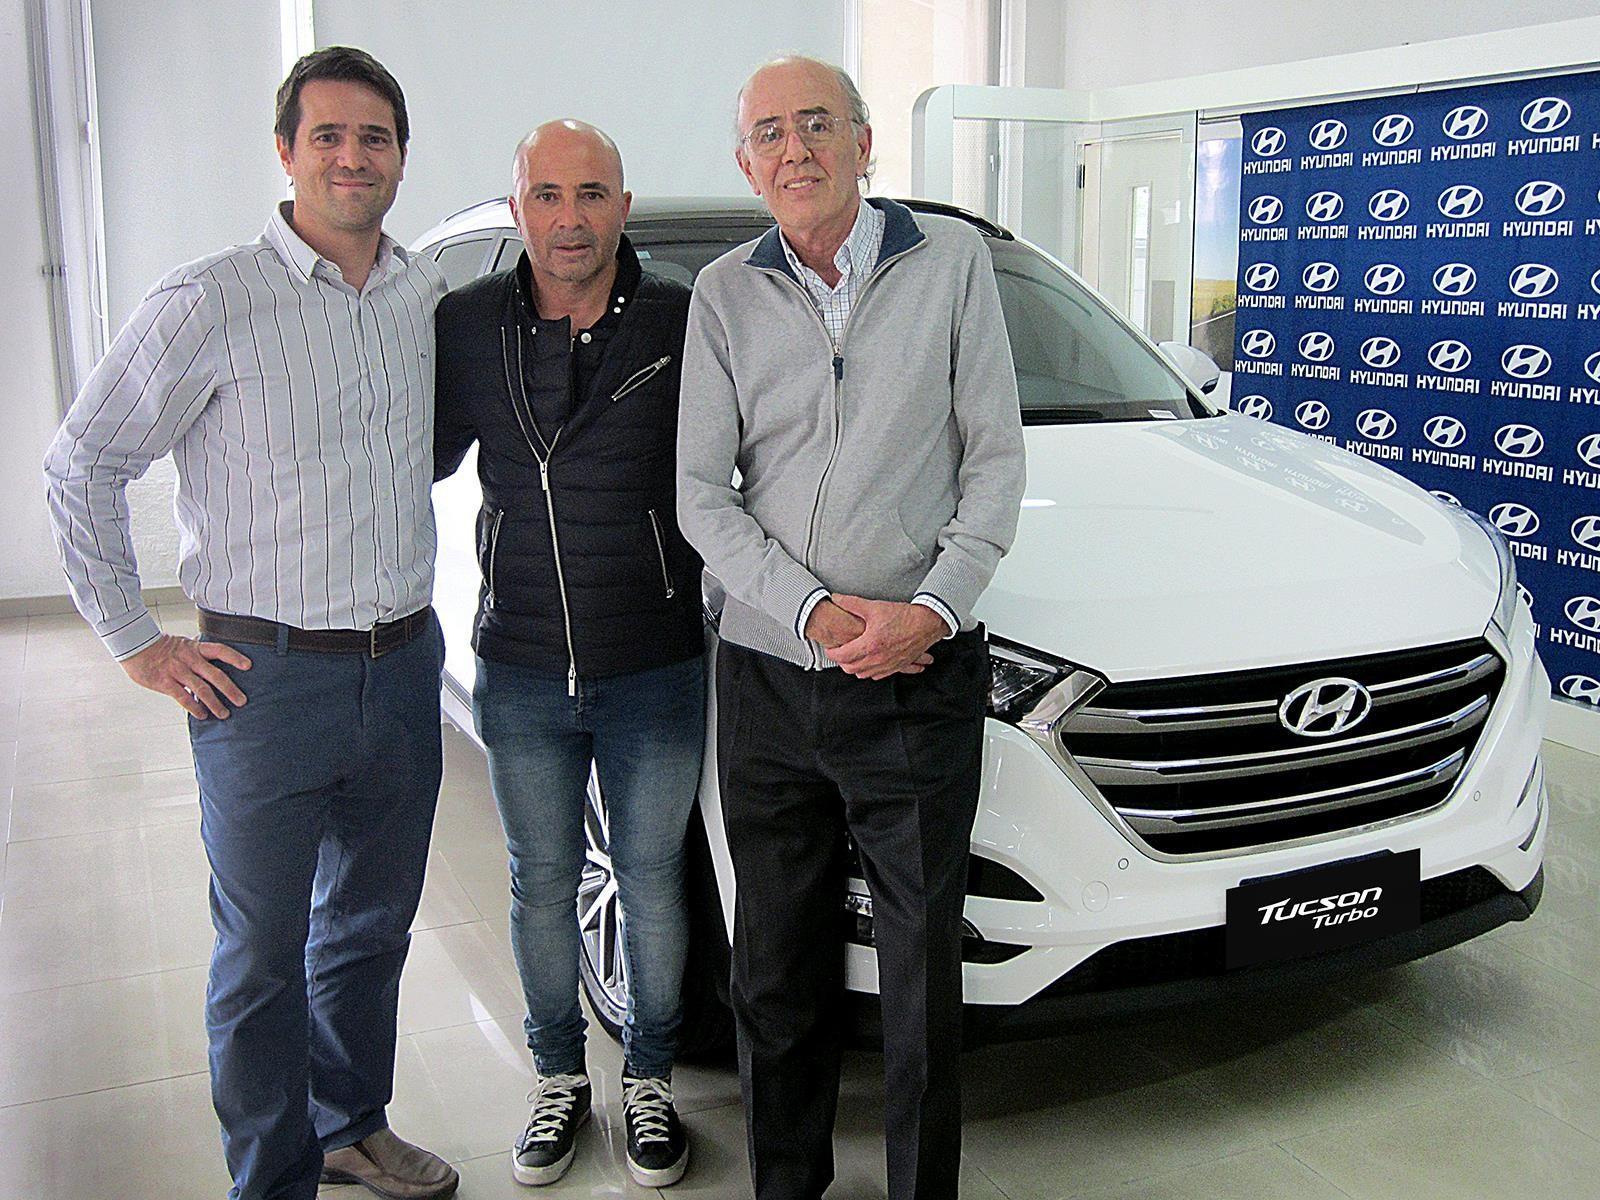 Ahora sí: Jorge Sampaoli recibió una Hyundai Tucson Turbo